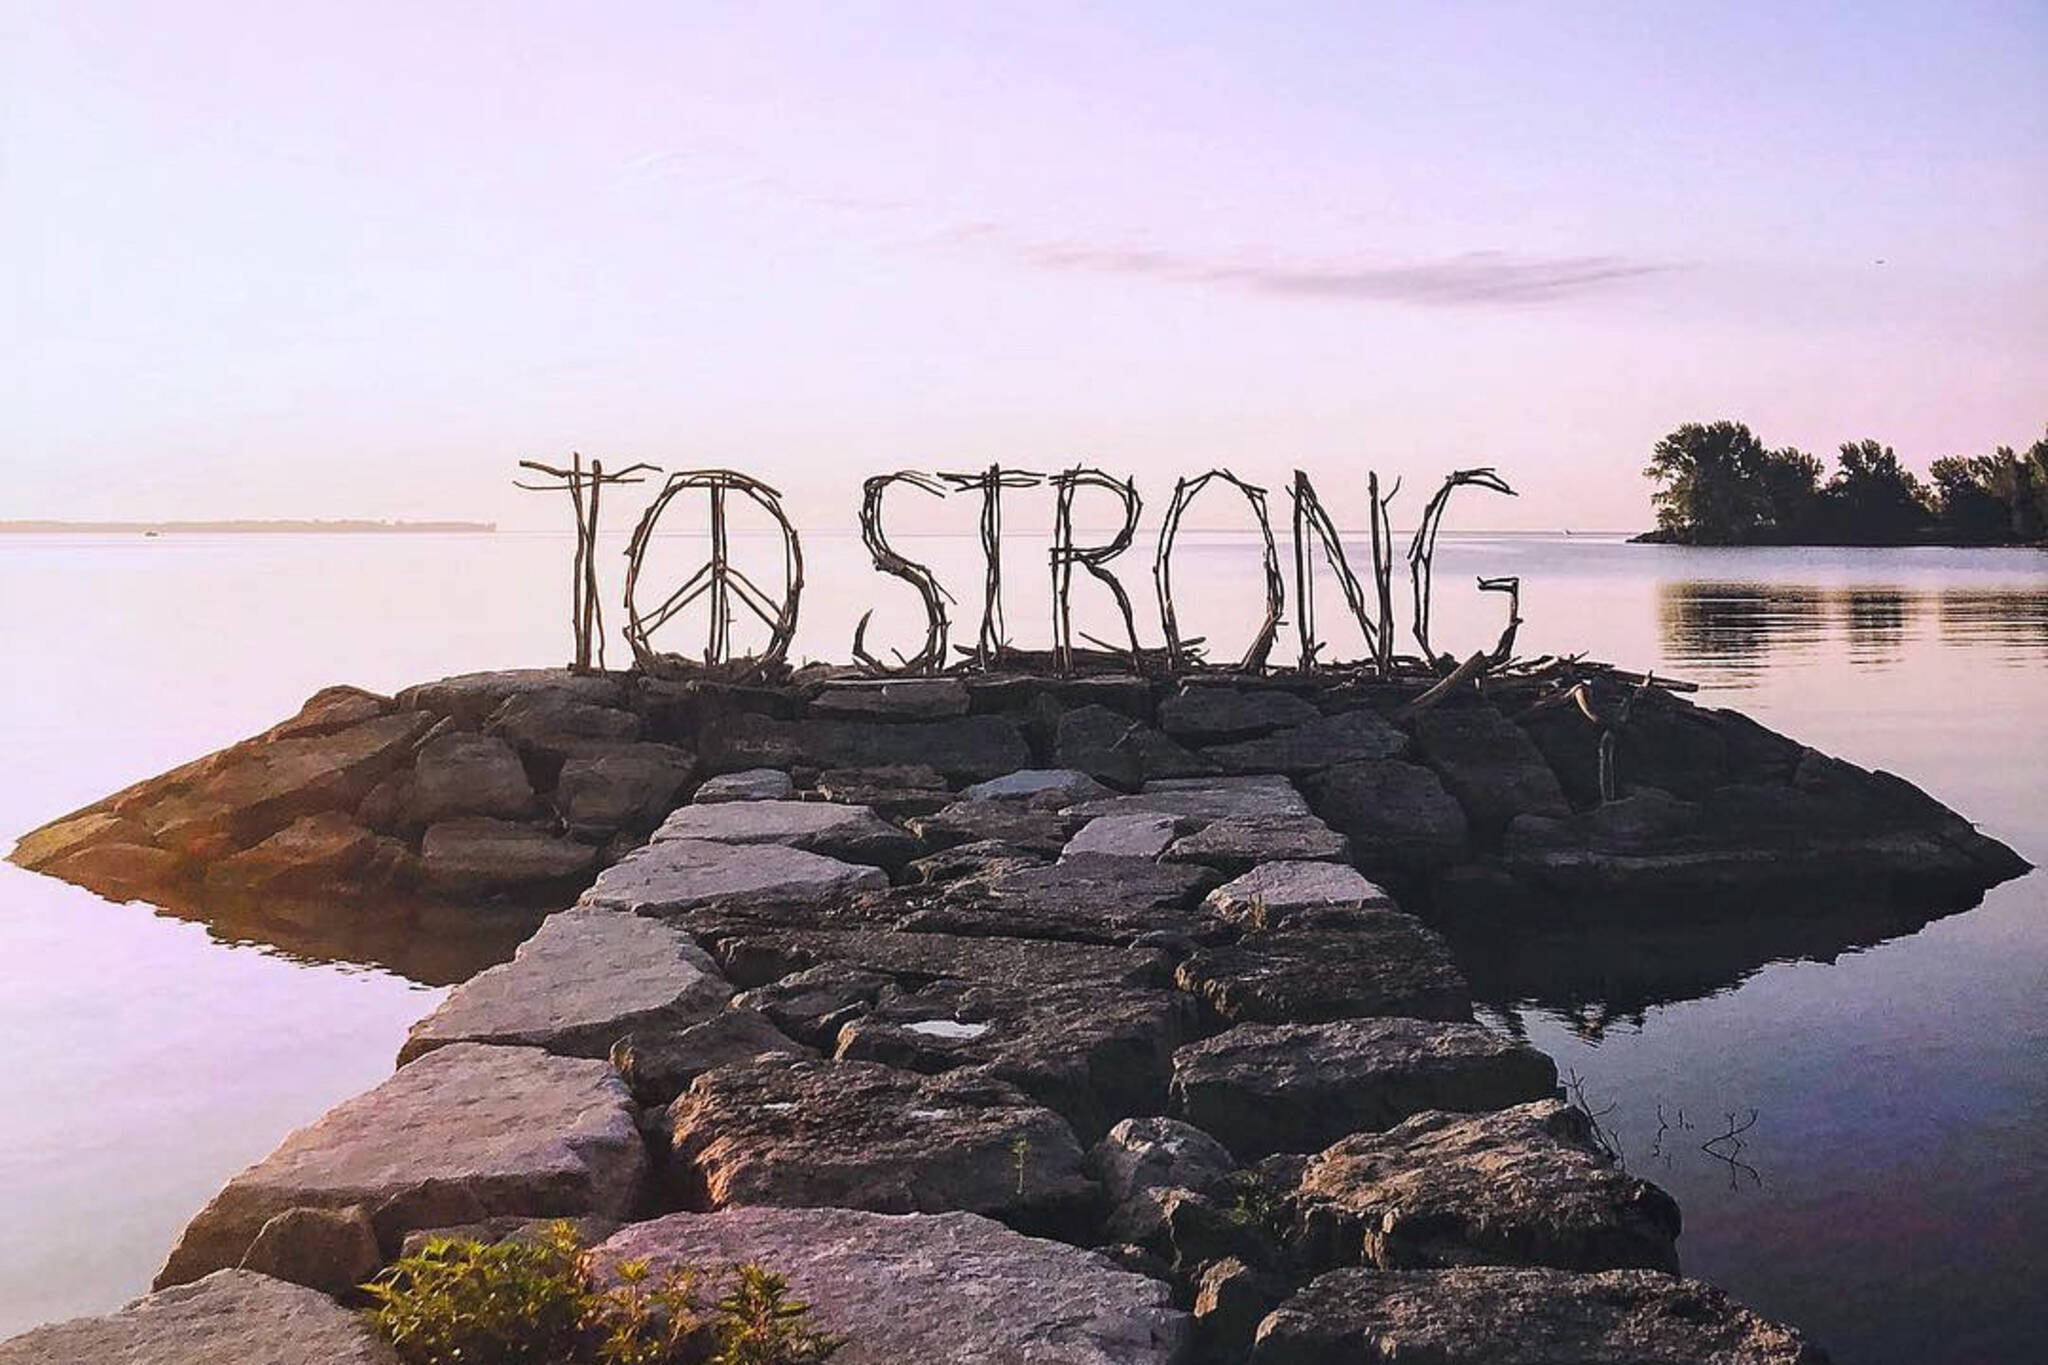 toronto strong driftwood sign